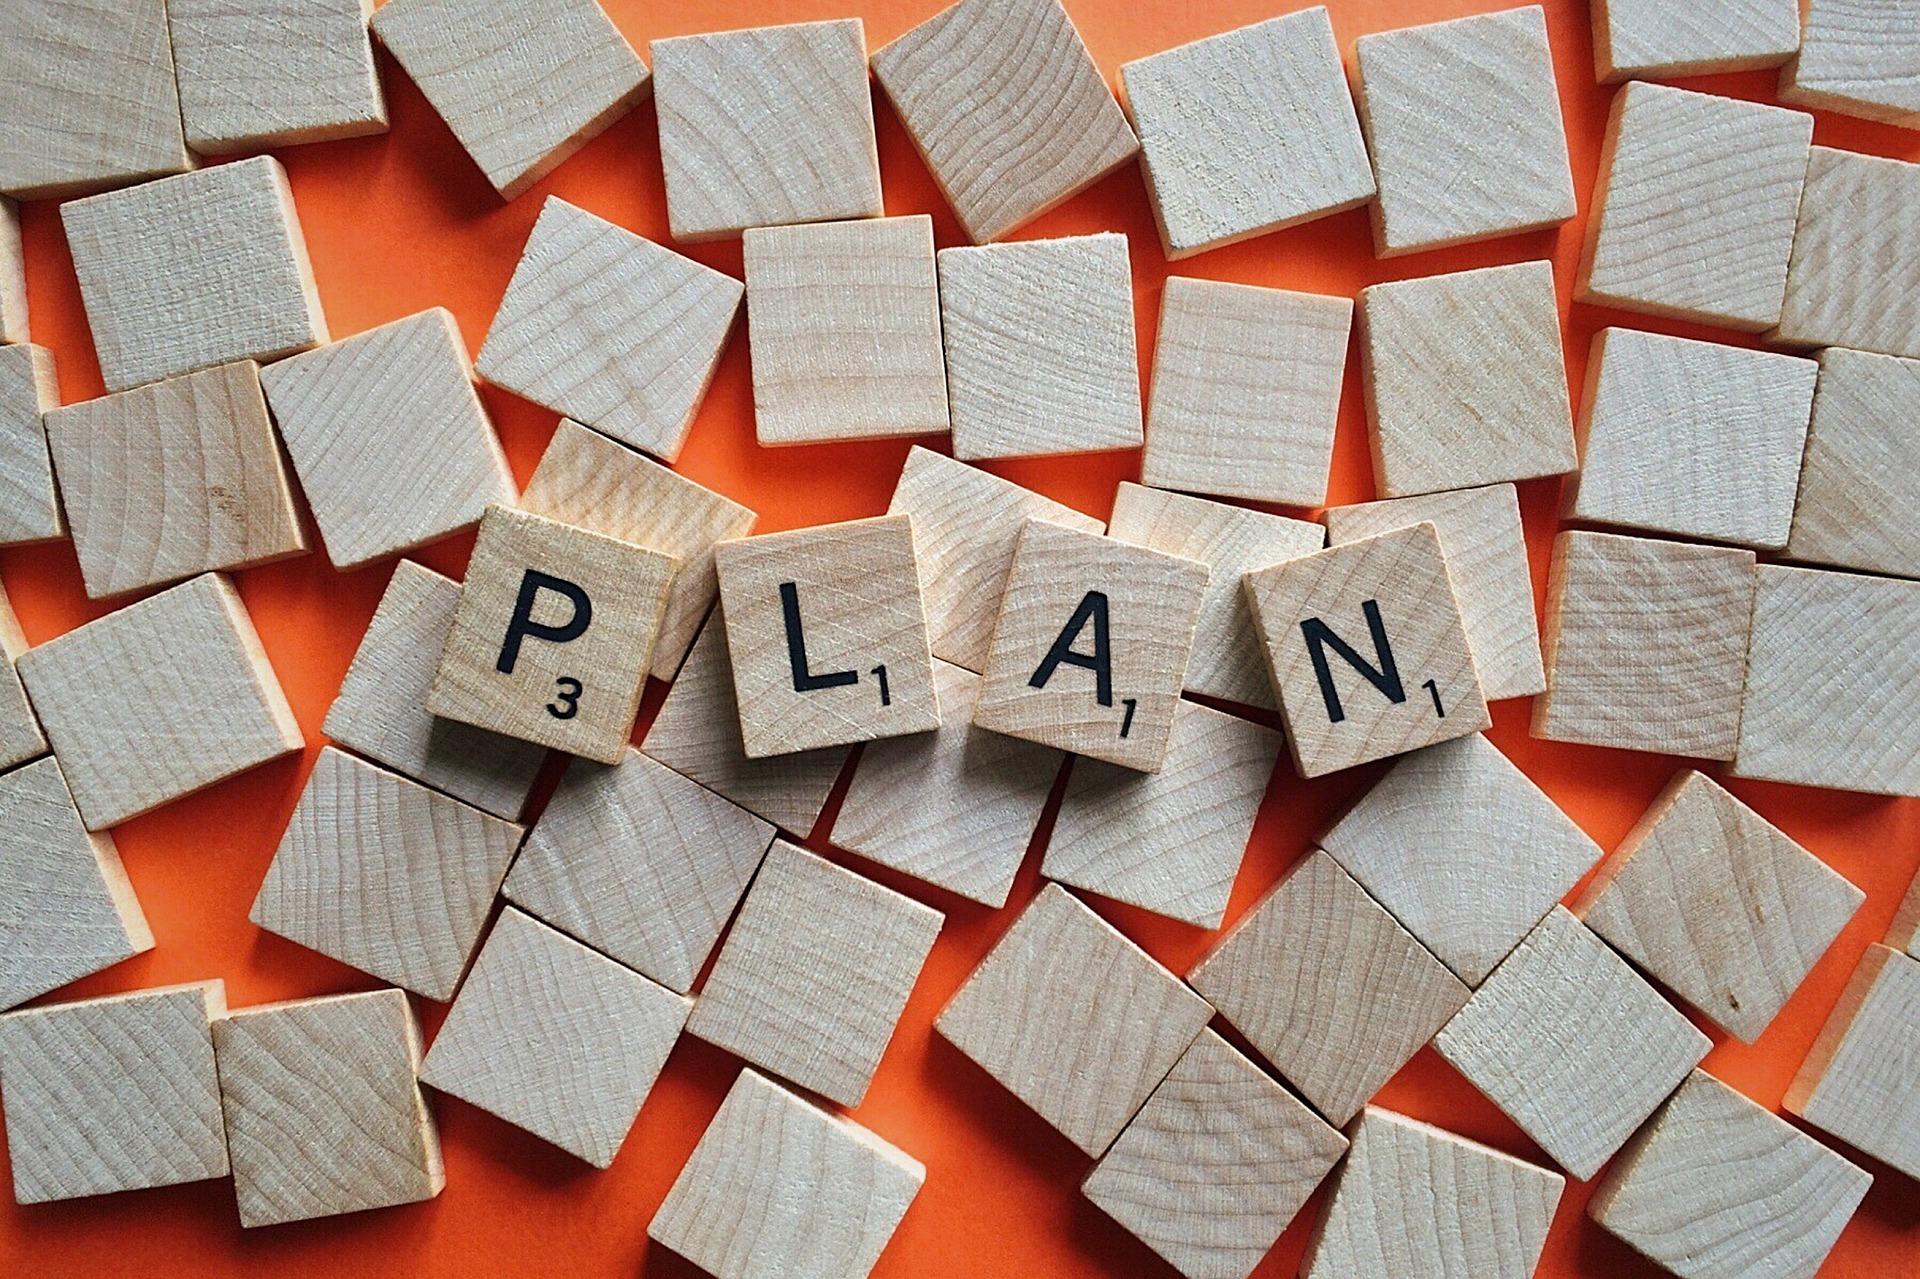 revisit your strategic plan